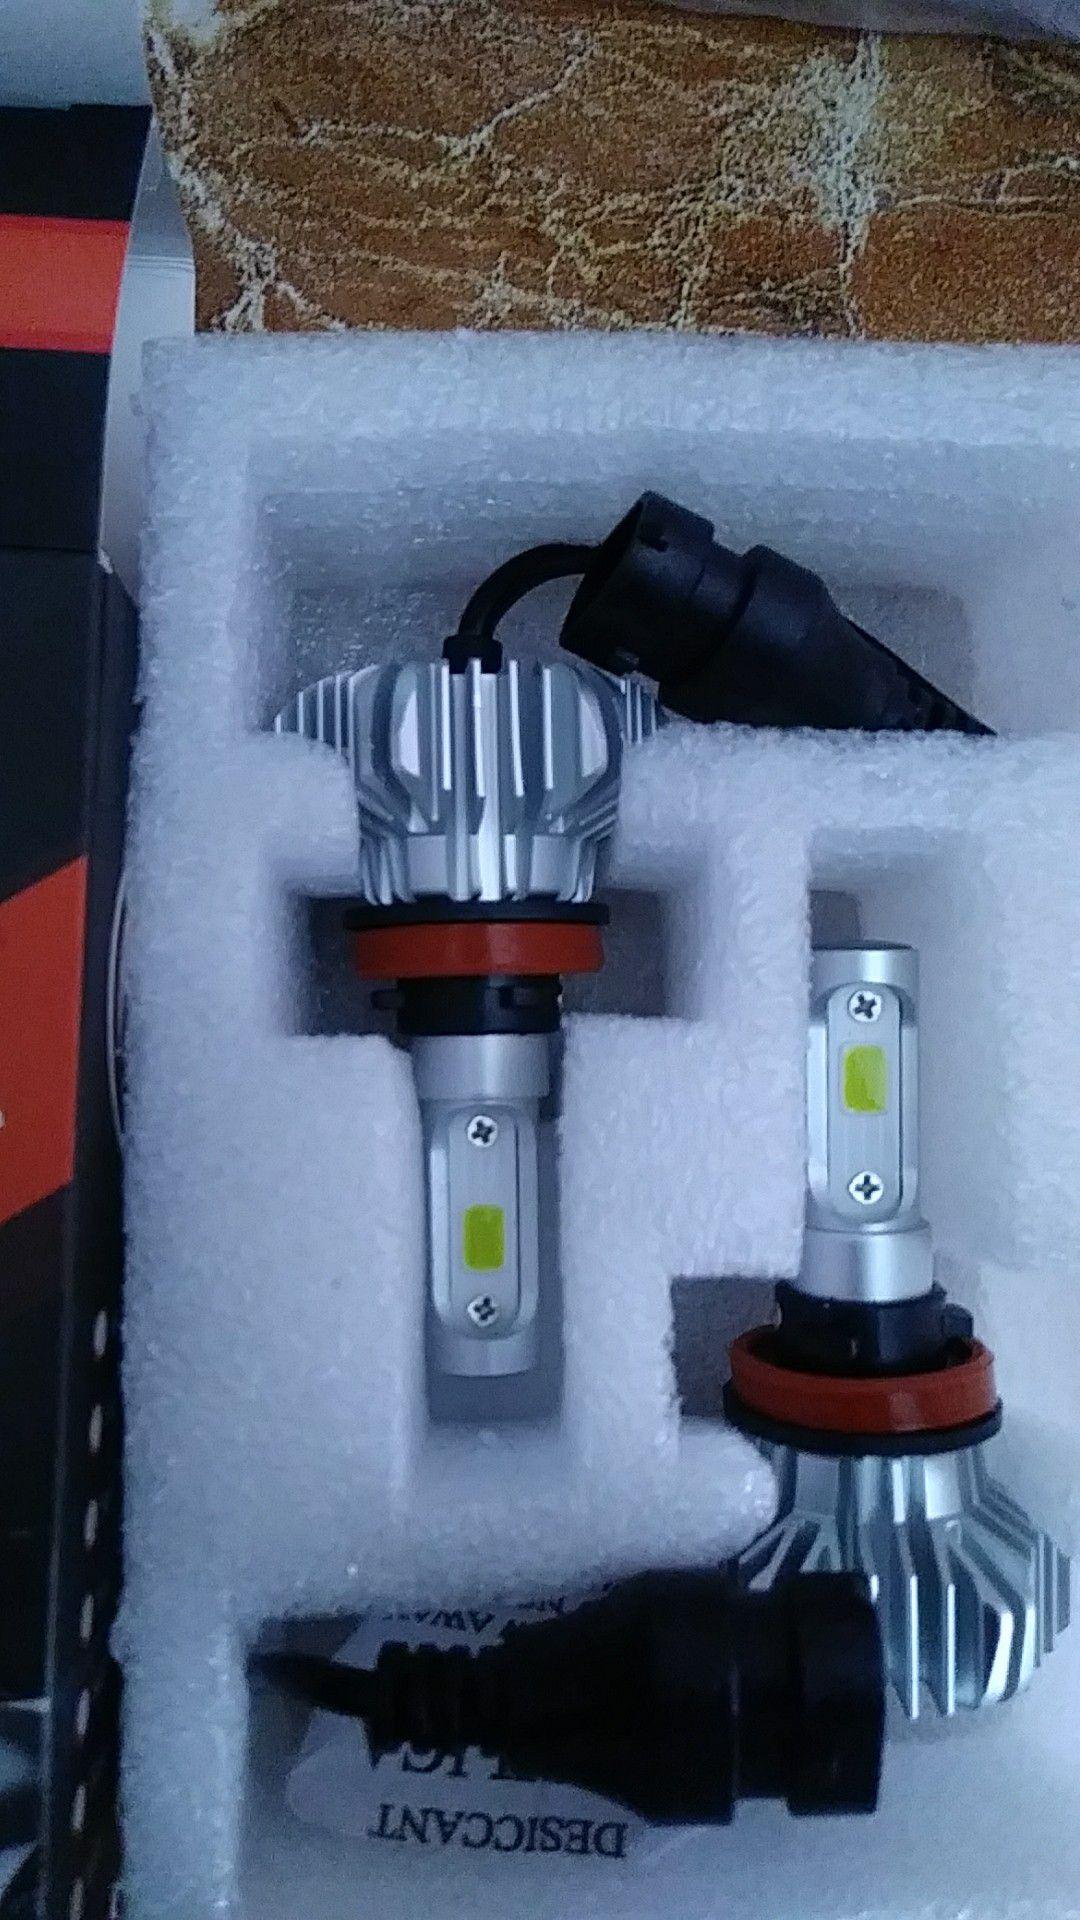 H11 led headlight conversion